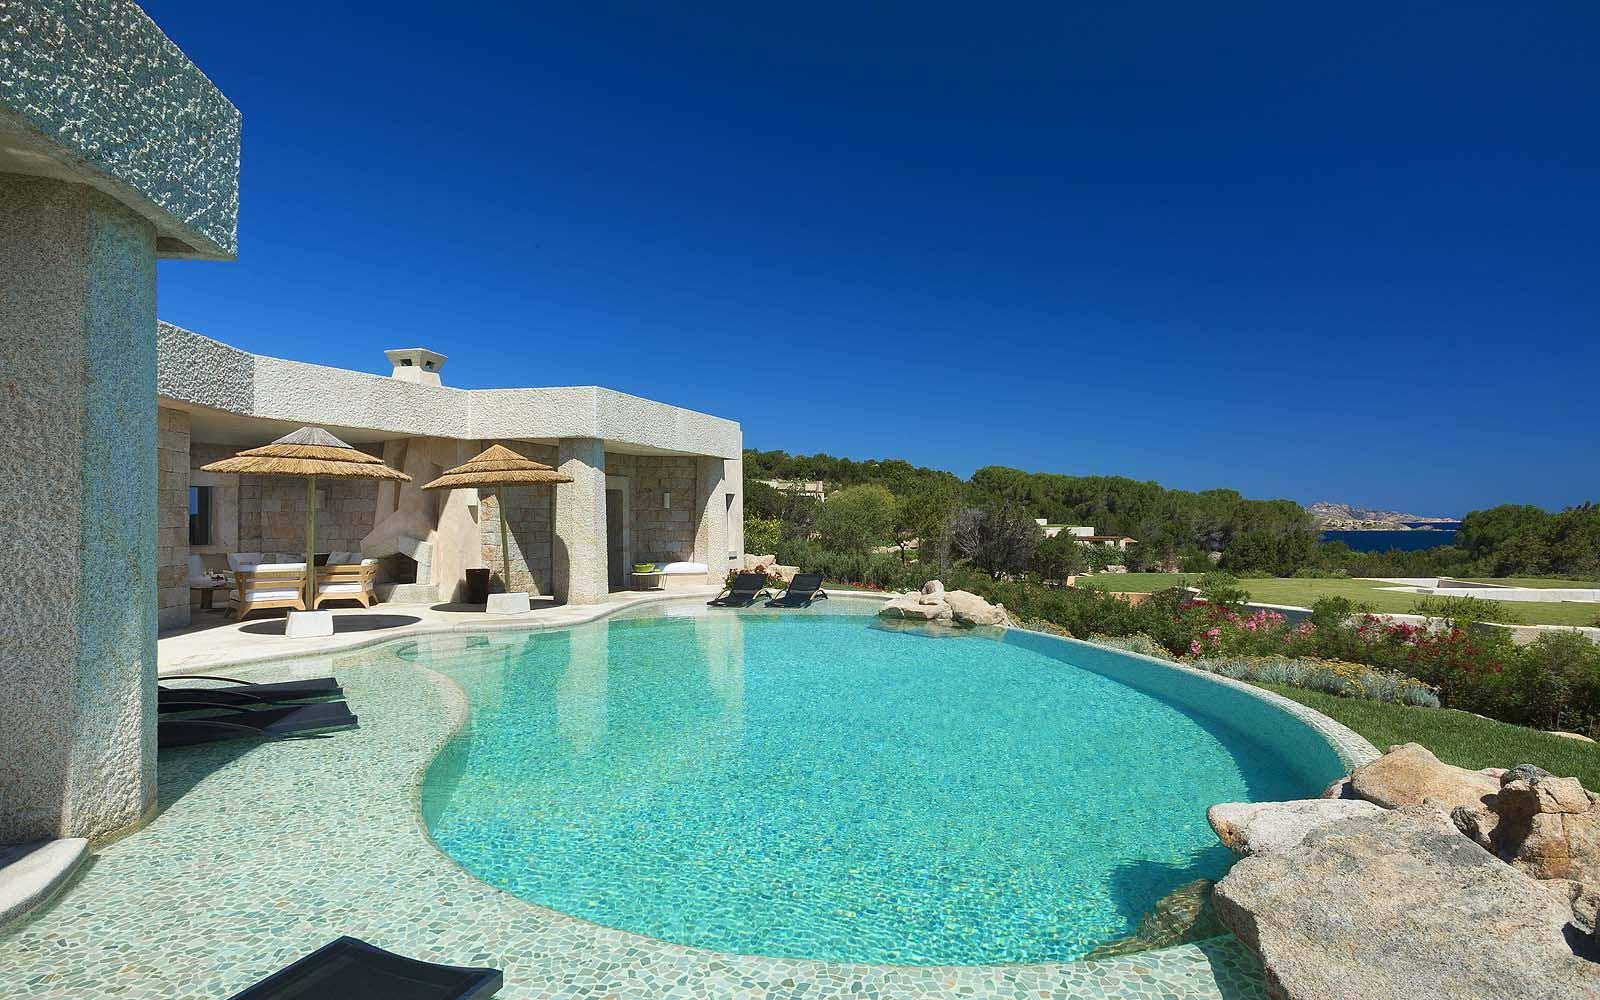 Three Bedroom Villa Shardana with private pool at the Hotel Pitrizza